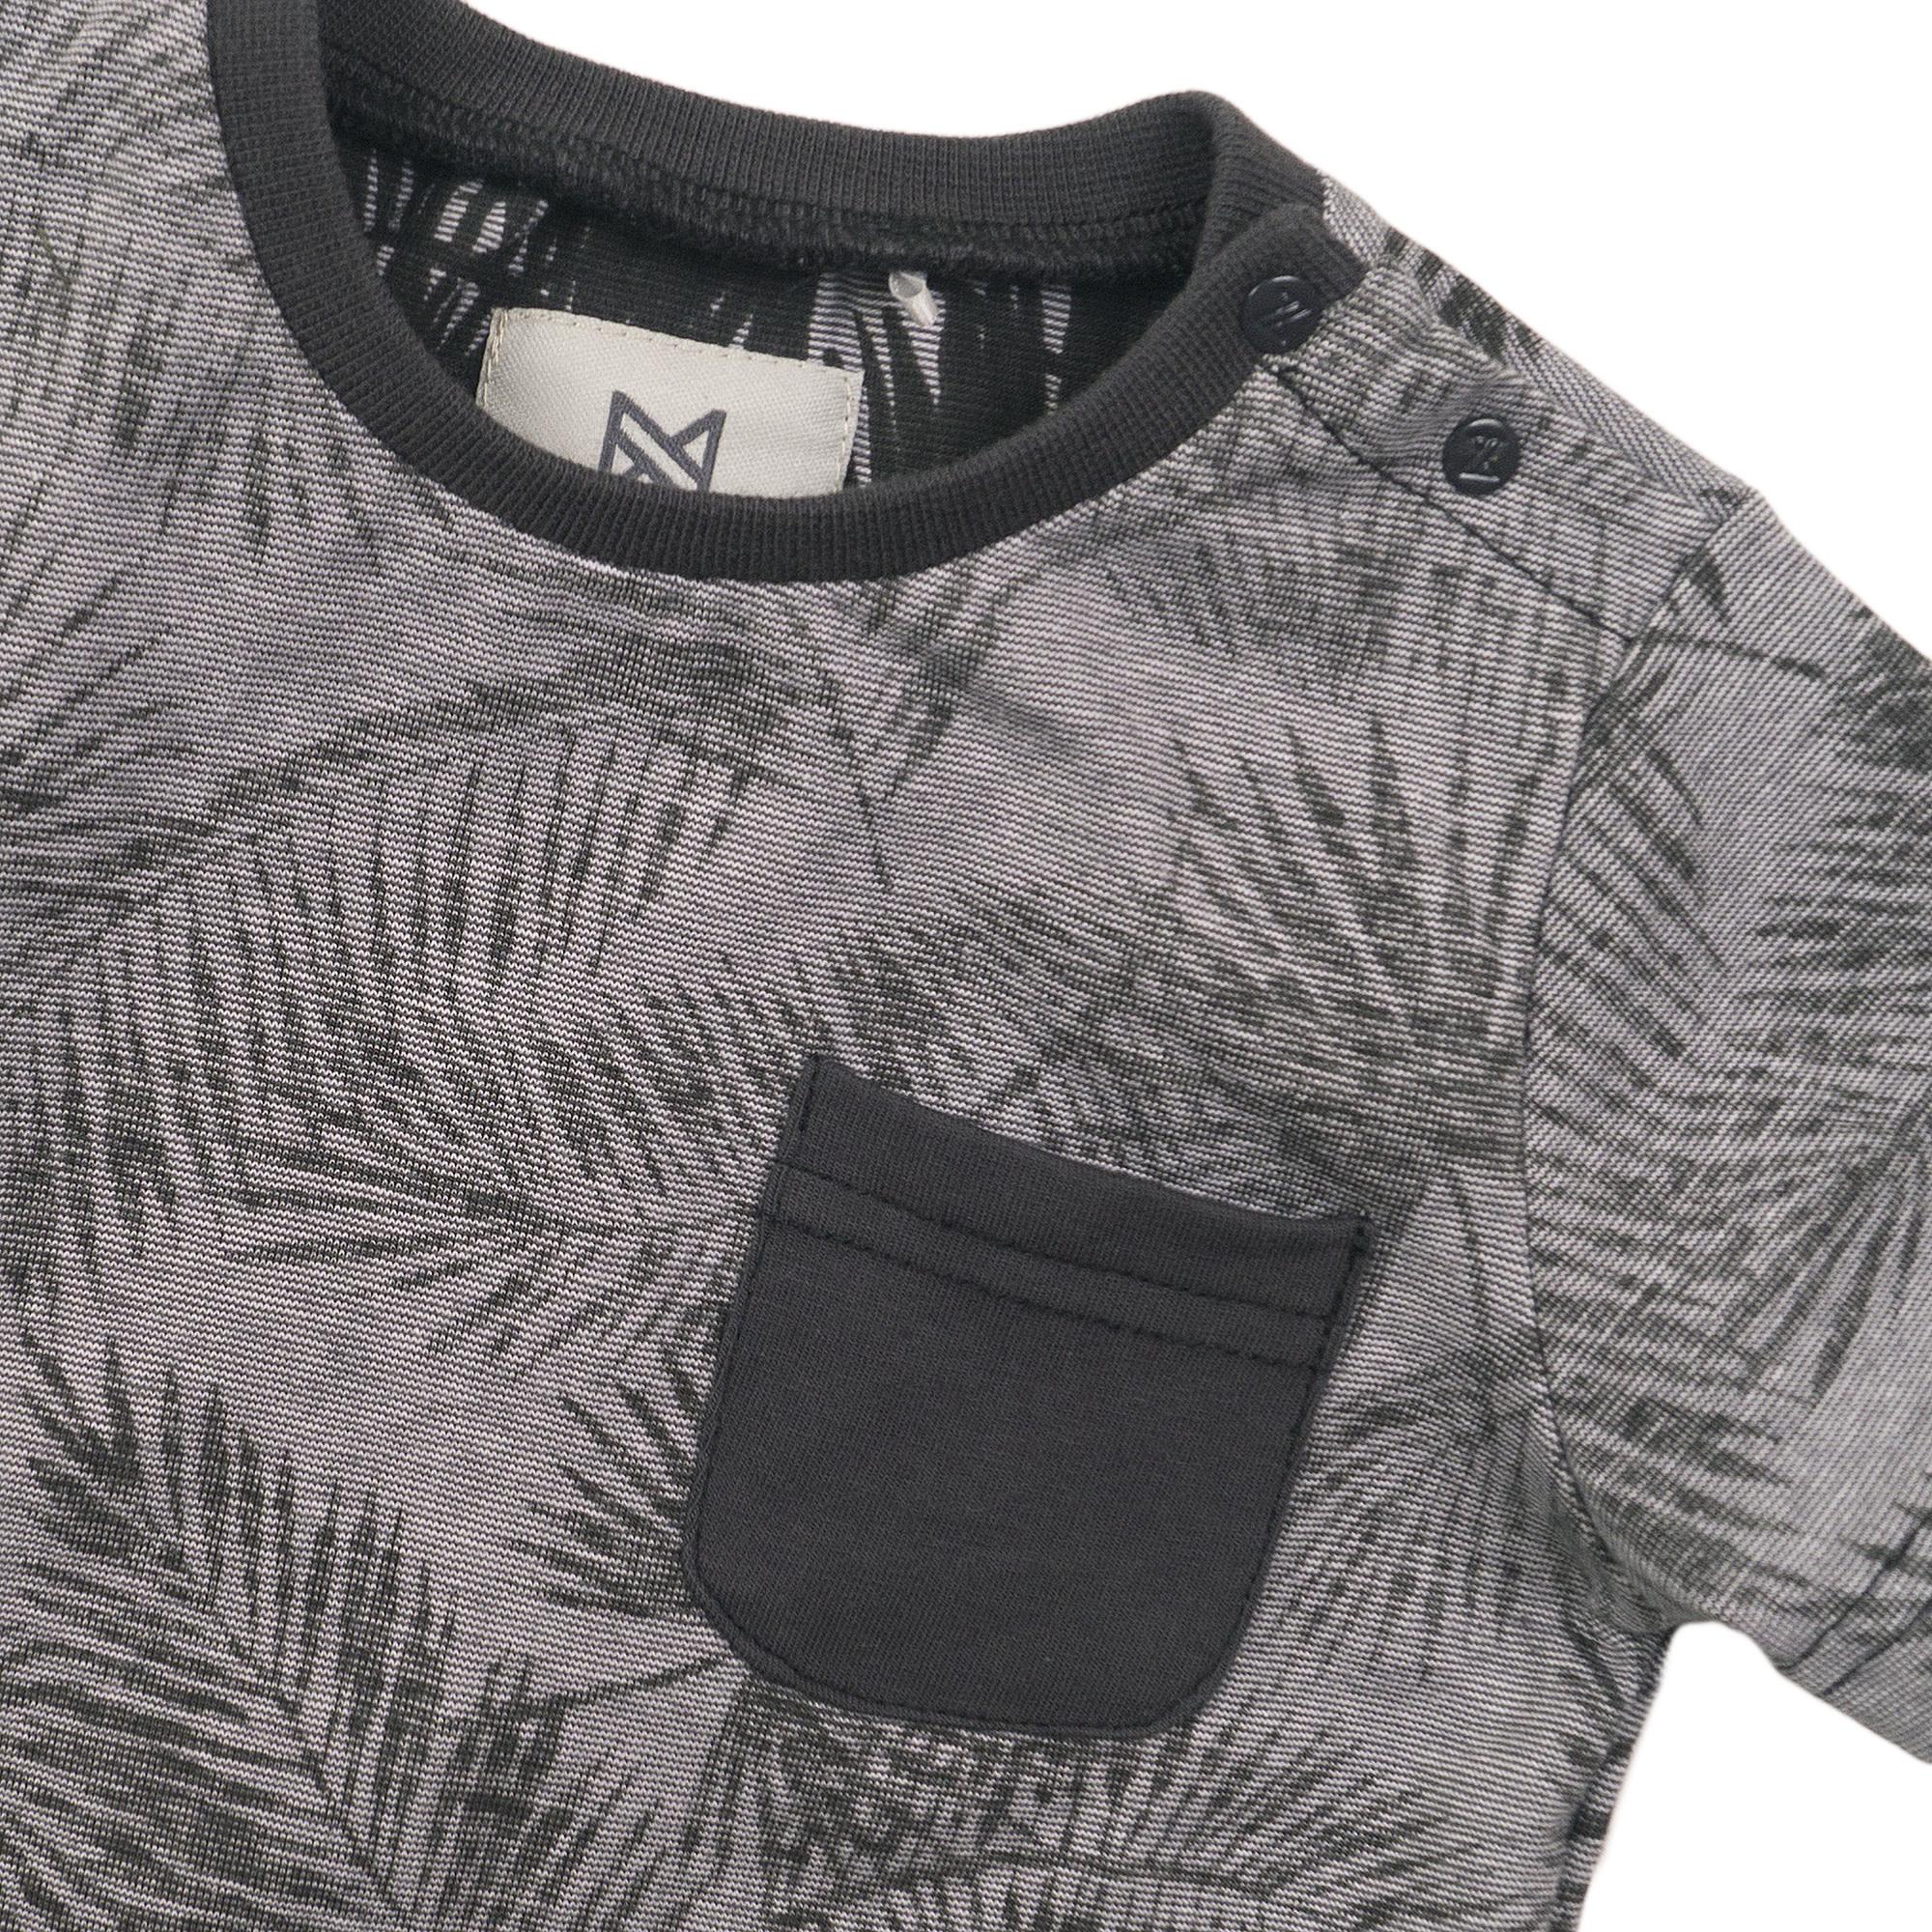 Koko Noko Jongens Shirtje KM Bladeren E38834-37-3